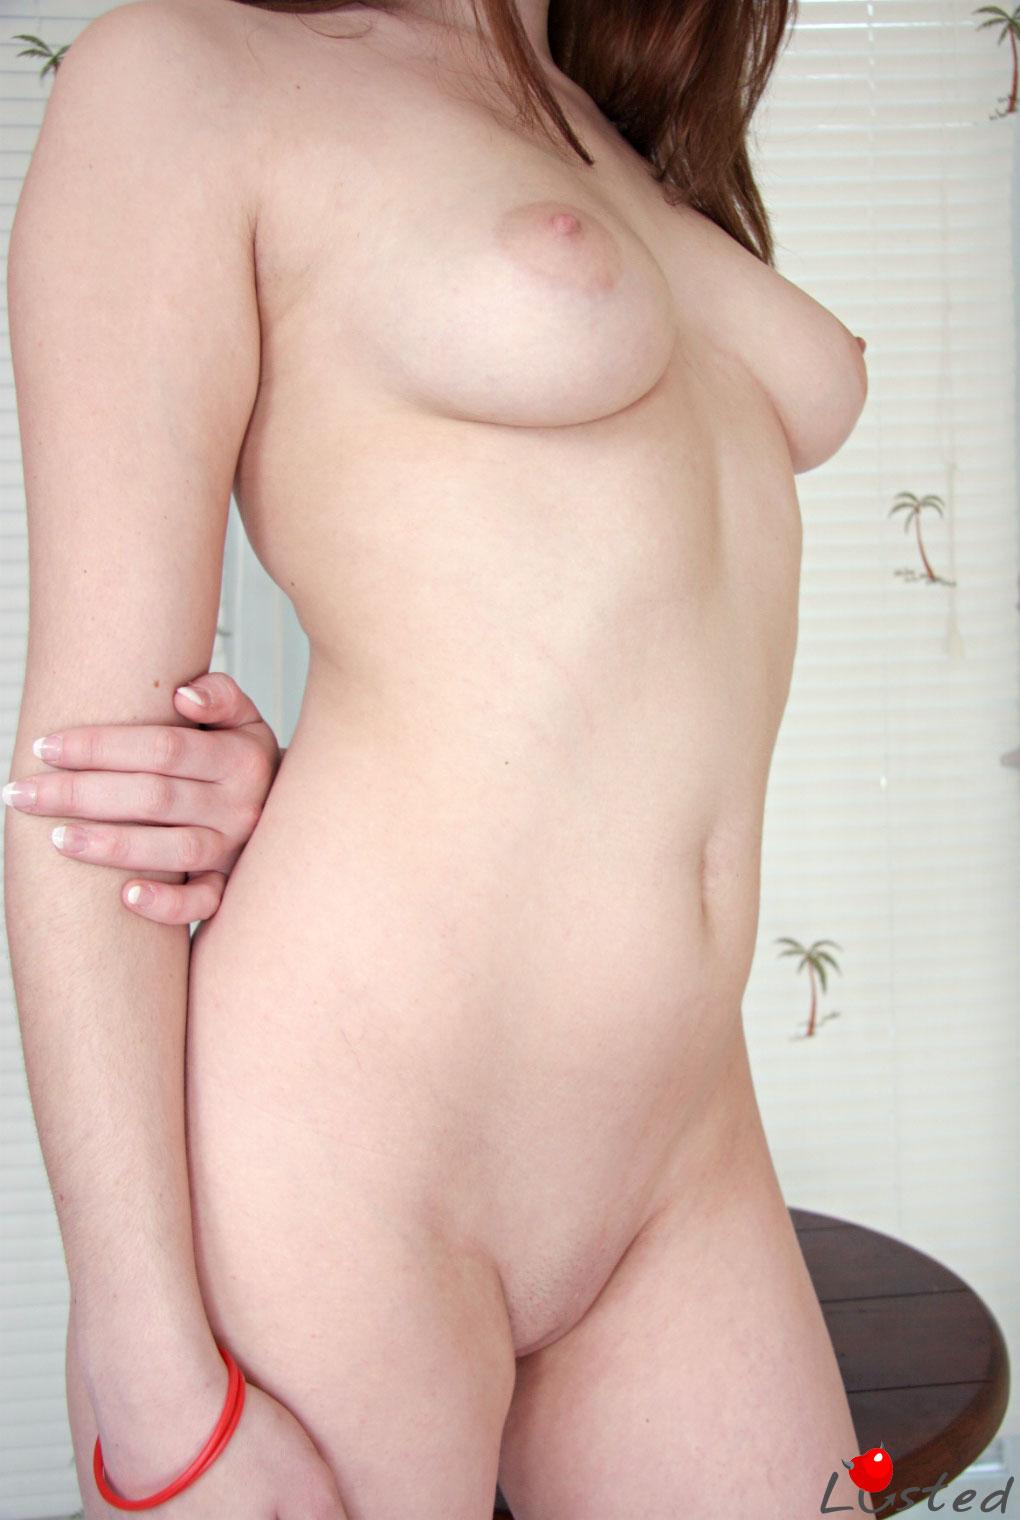 milf bitches porn gifs